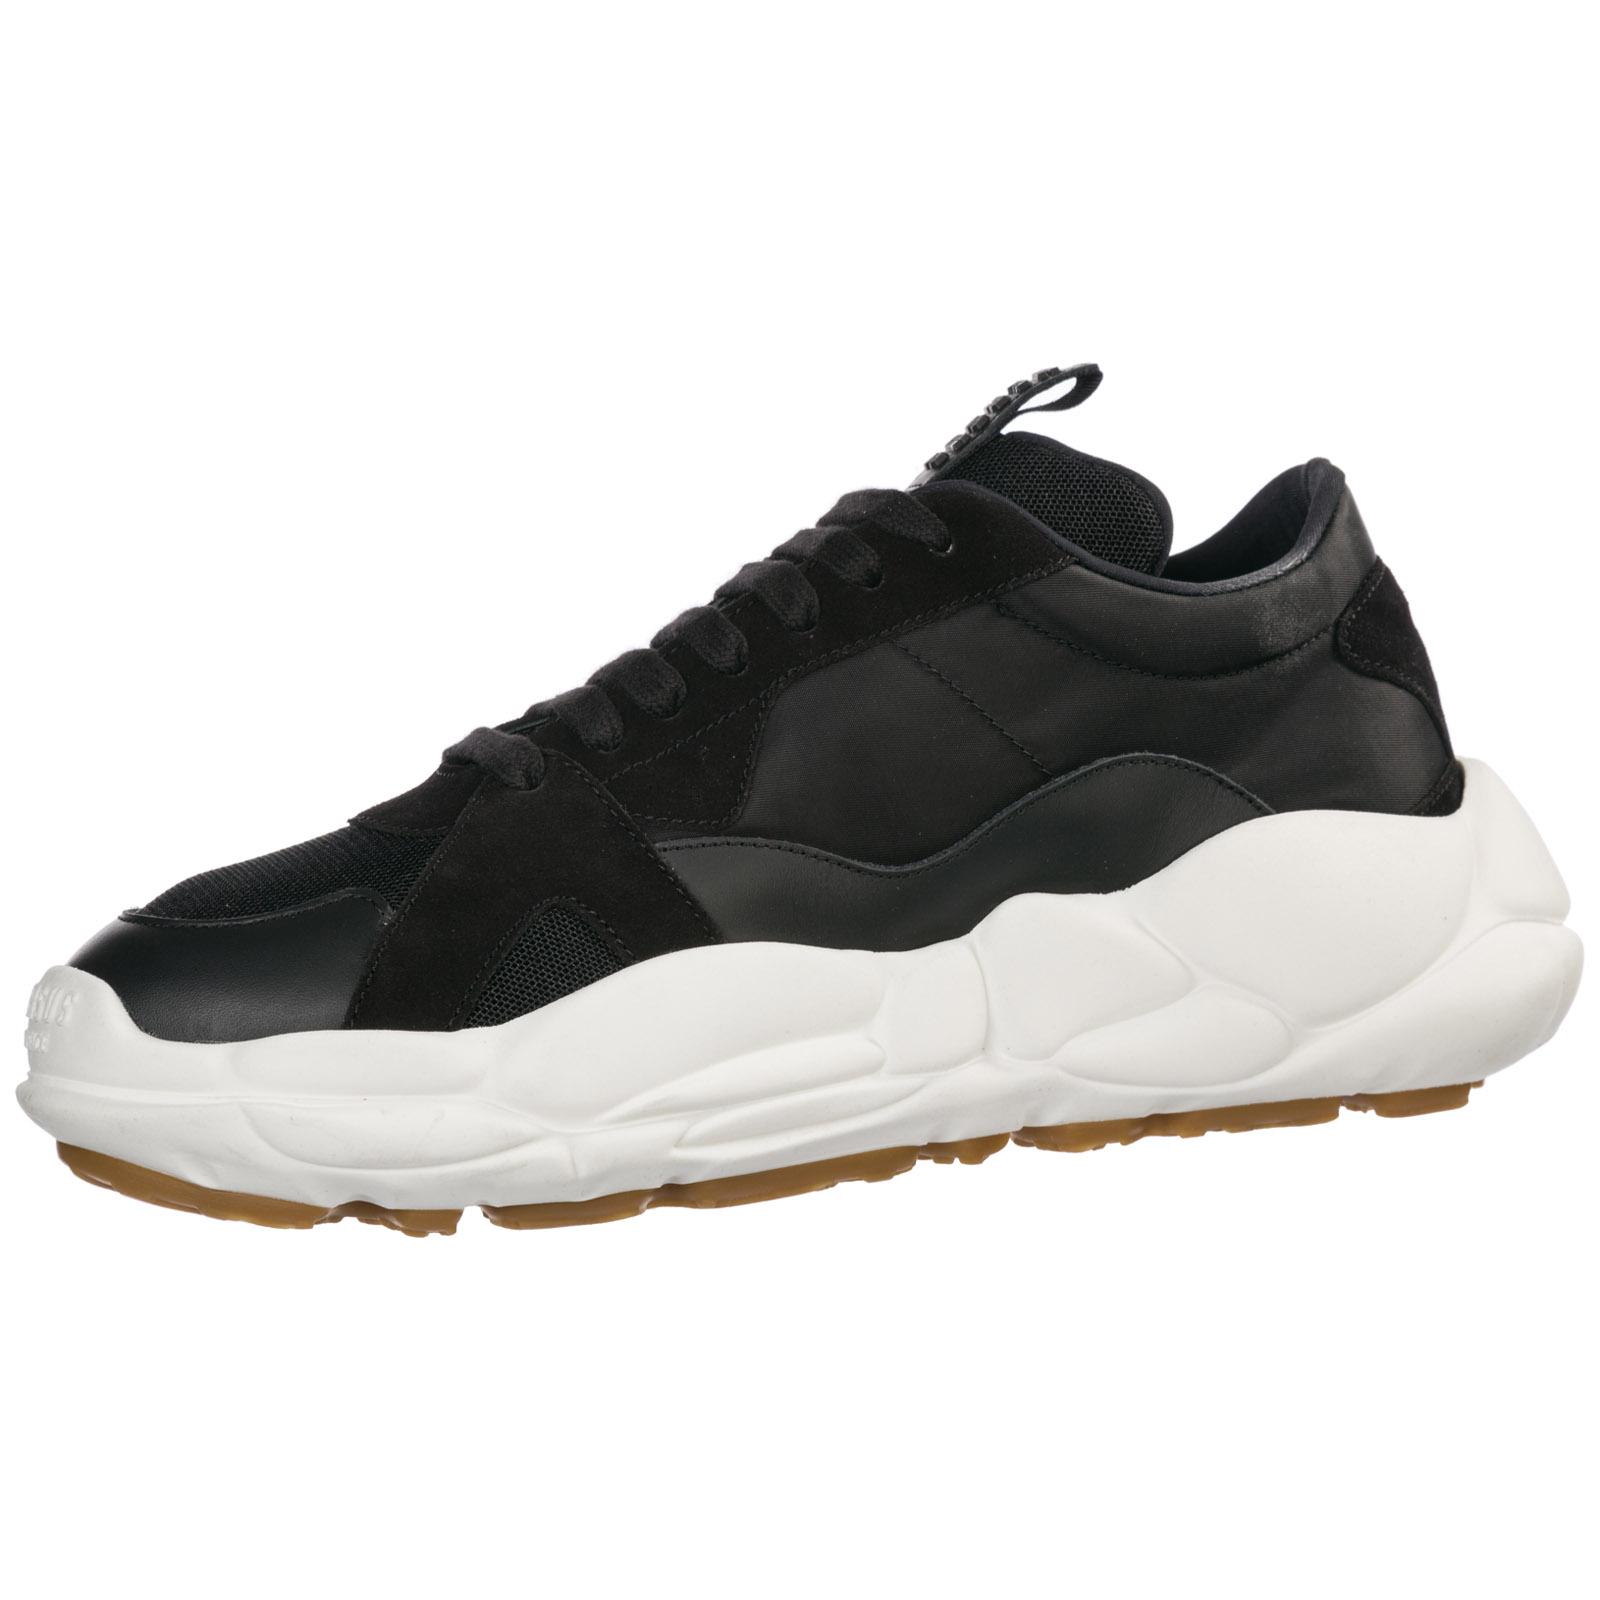 quality design e1169 be1cd Scarpe sneakers uomo camoscio